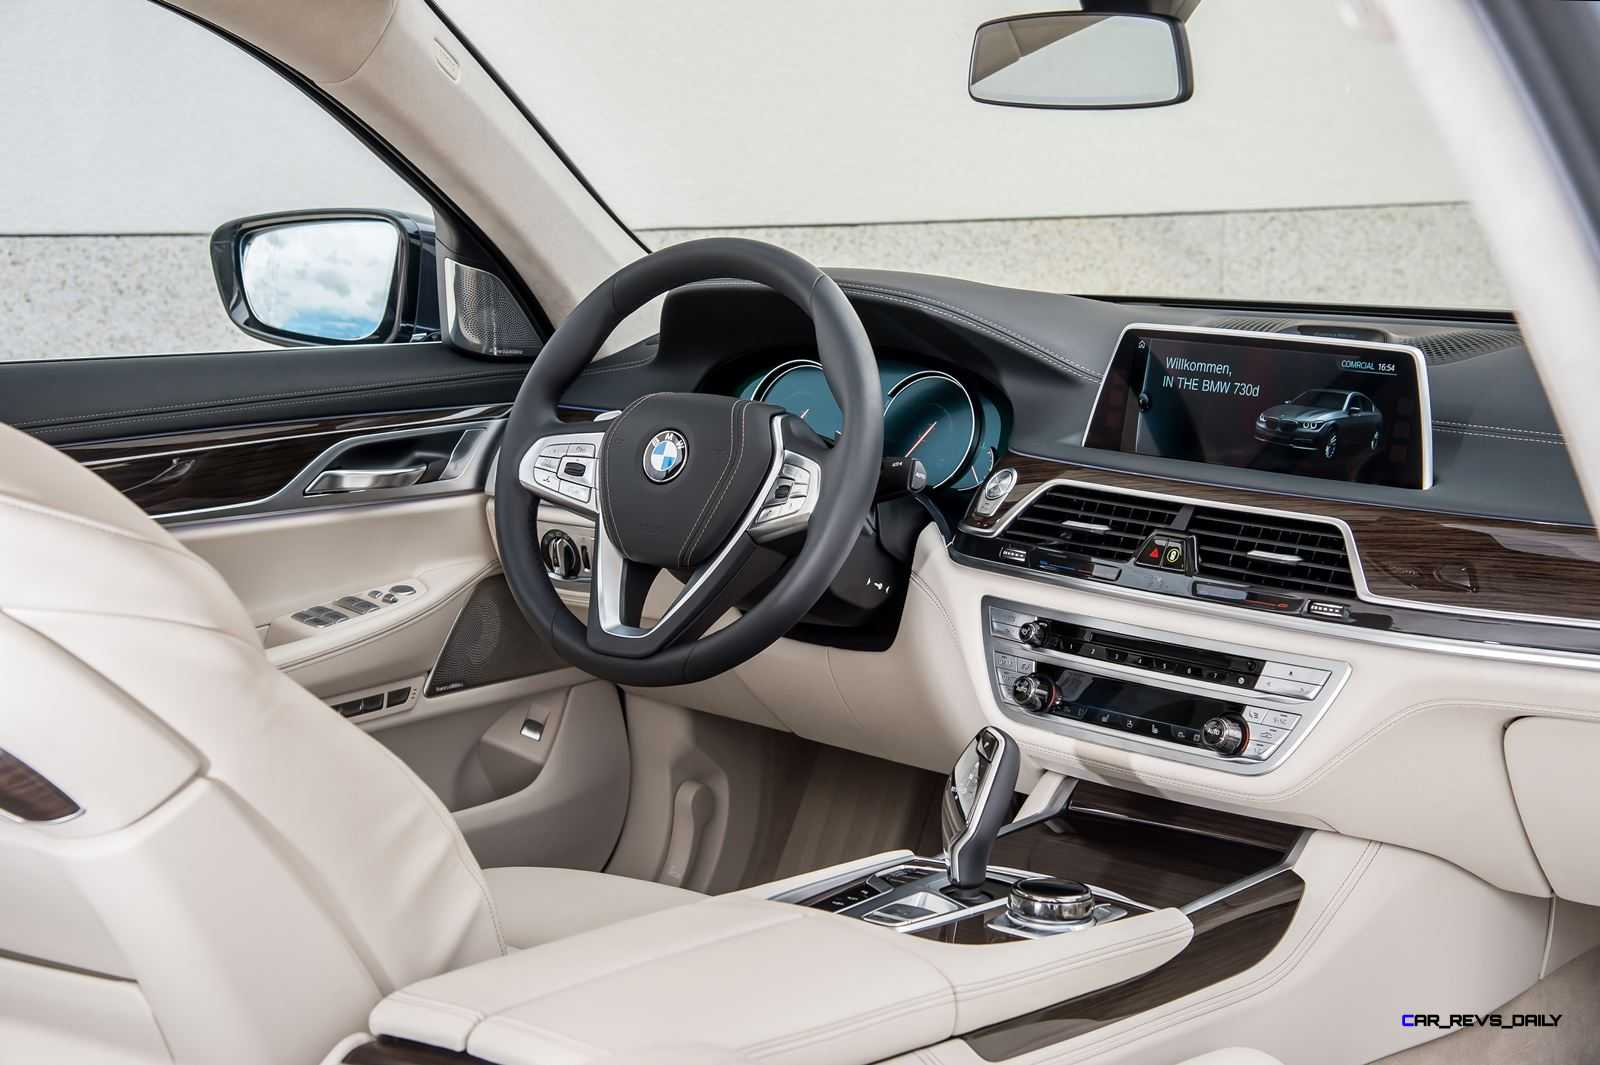 2016 BMW 750Li Interior 27